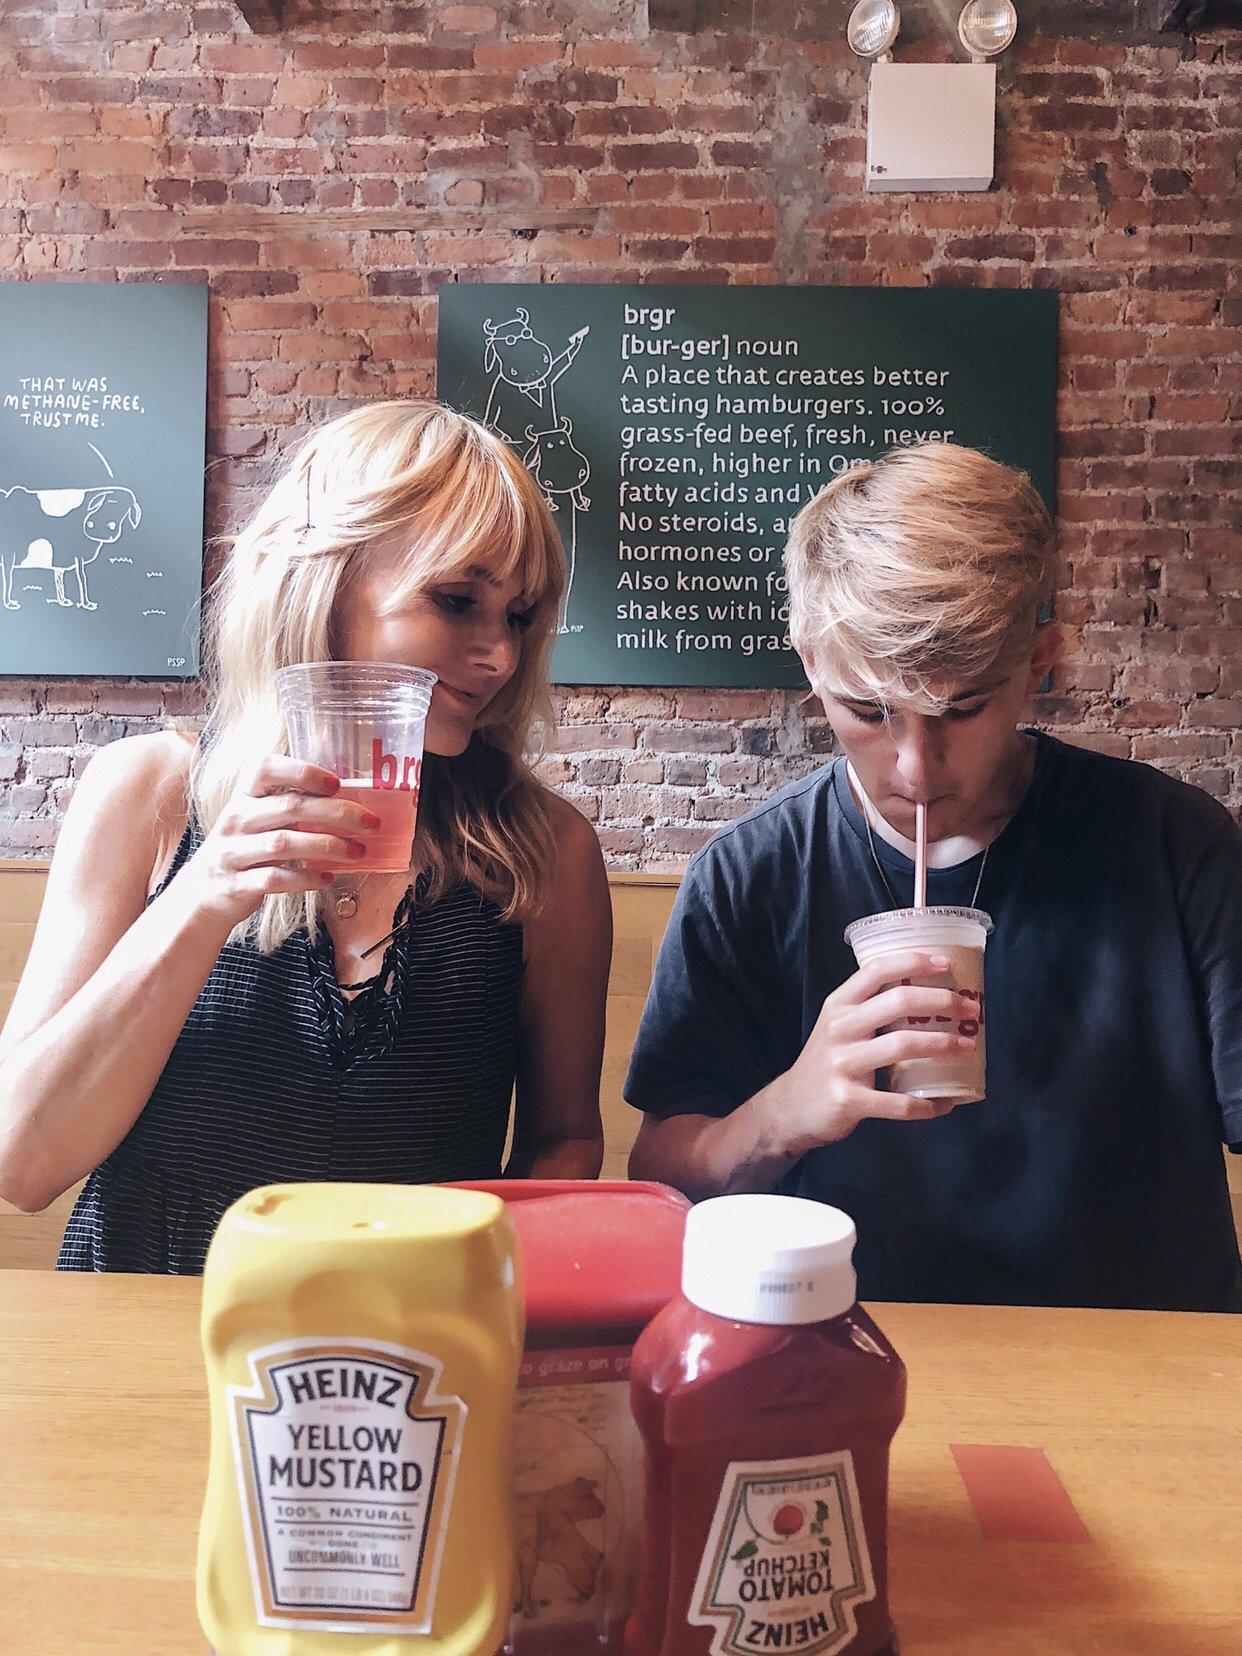 4 Tage in New York City - Pinkes Bier bei The Brgr - Nowshine Reiseblog ü 40